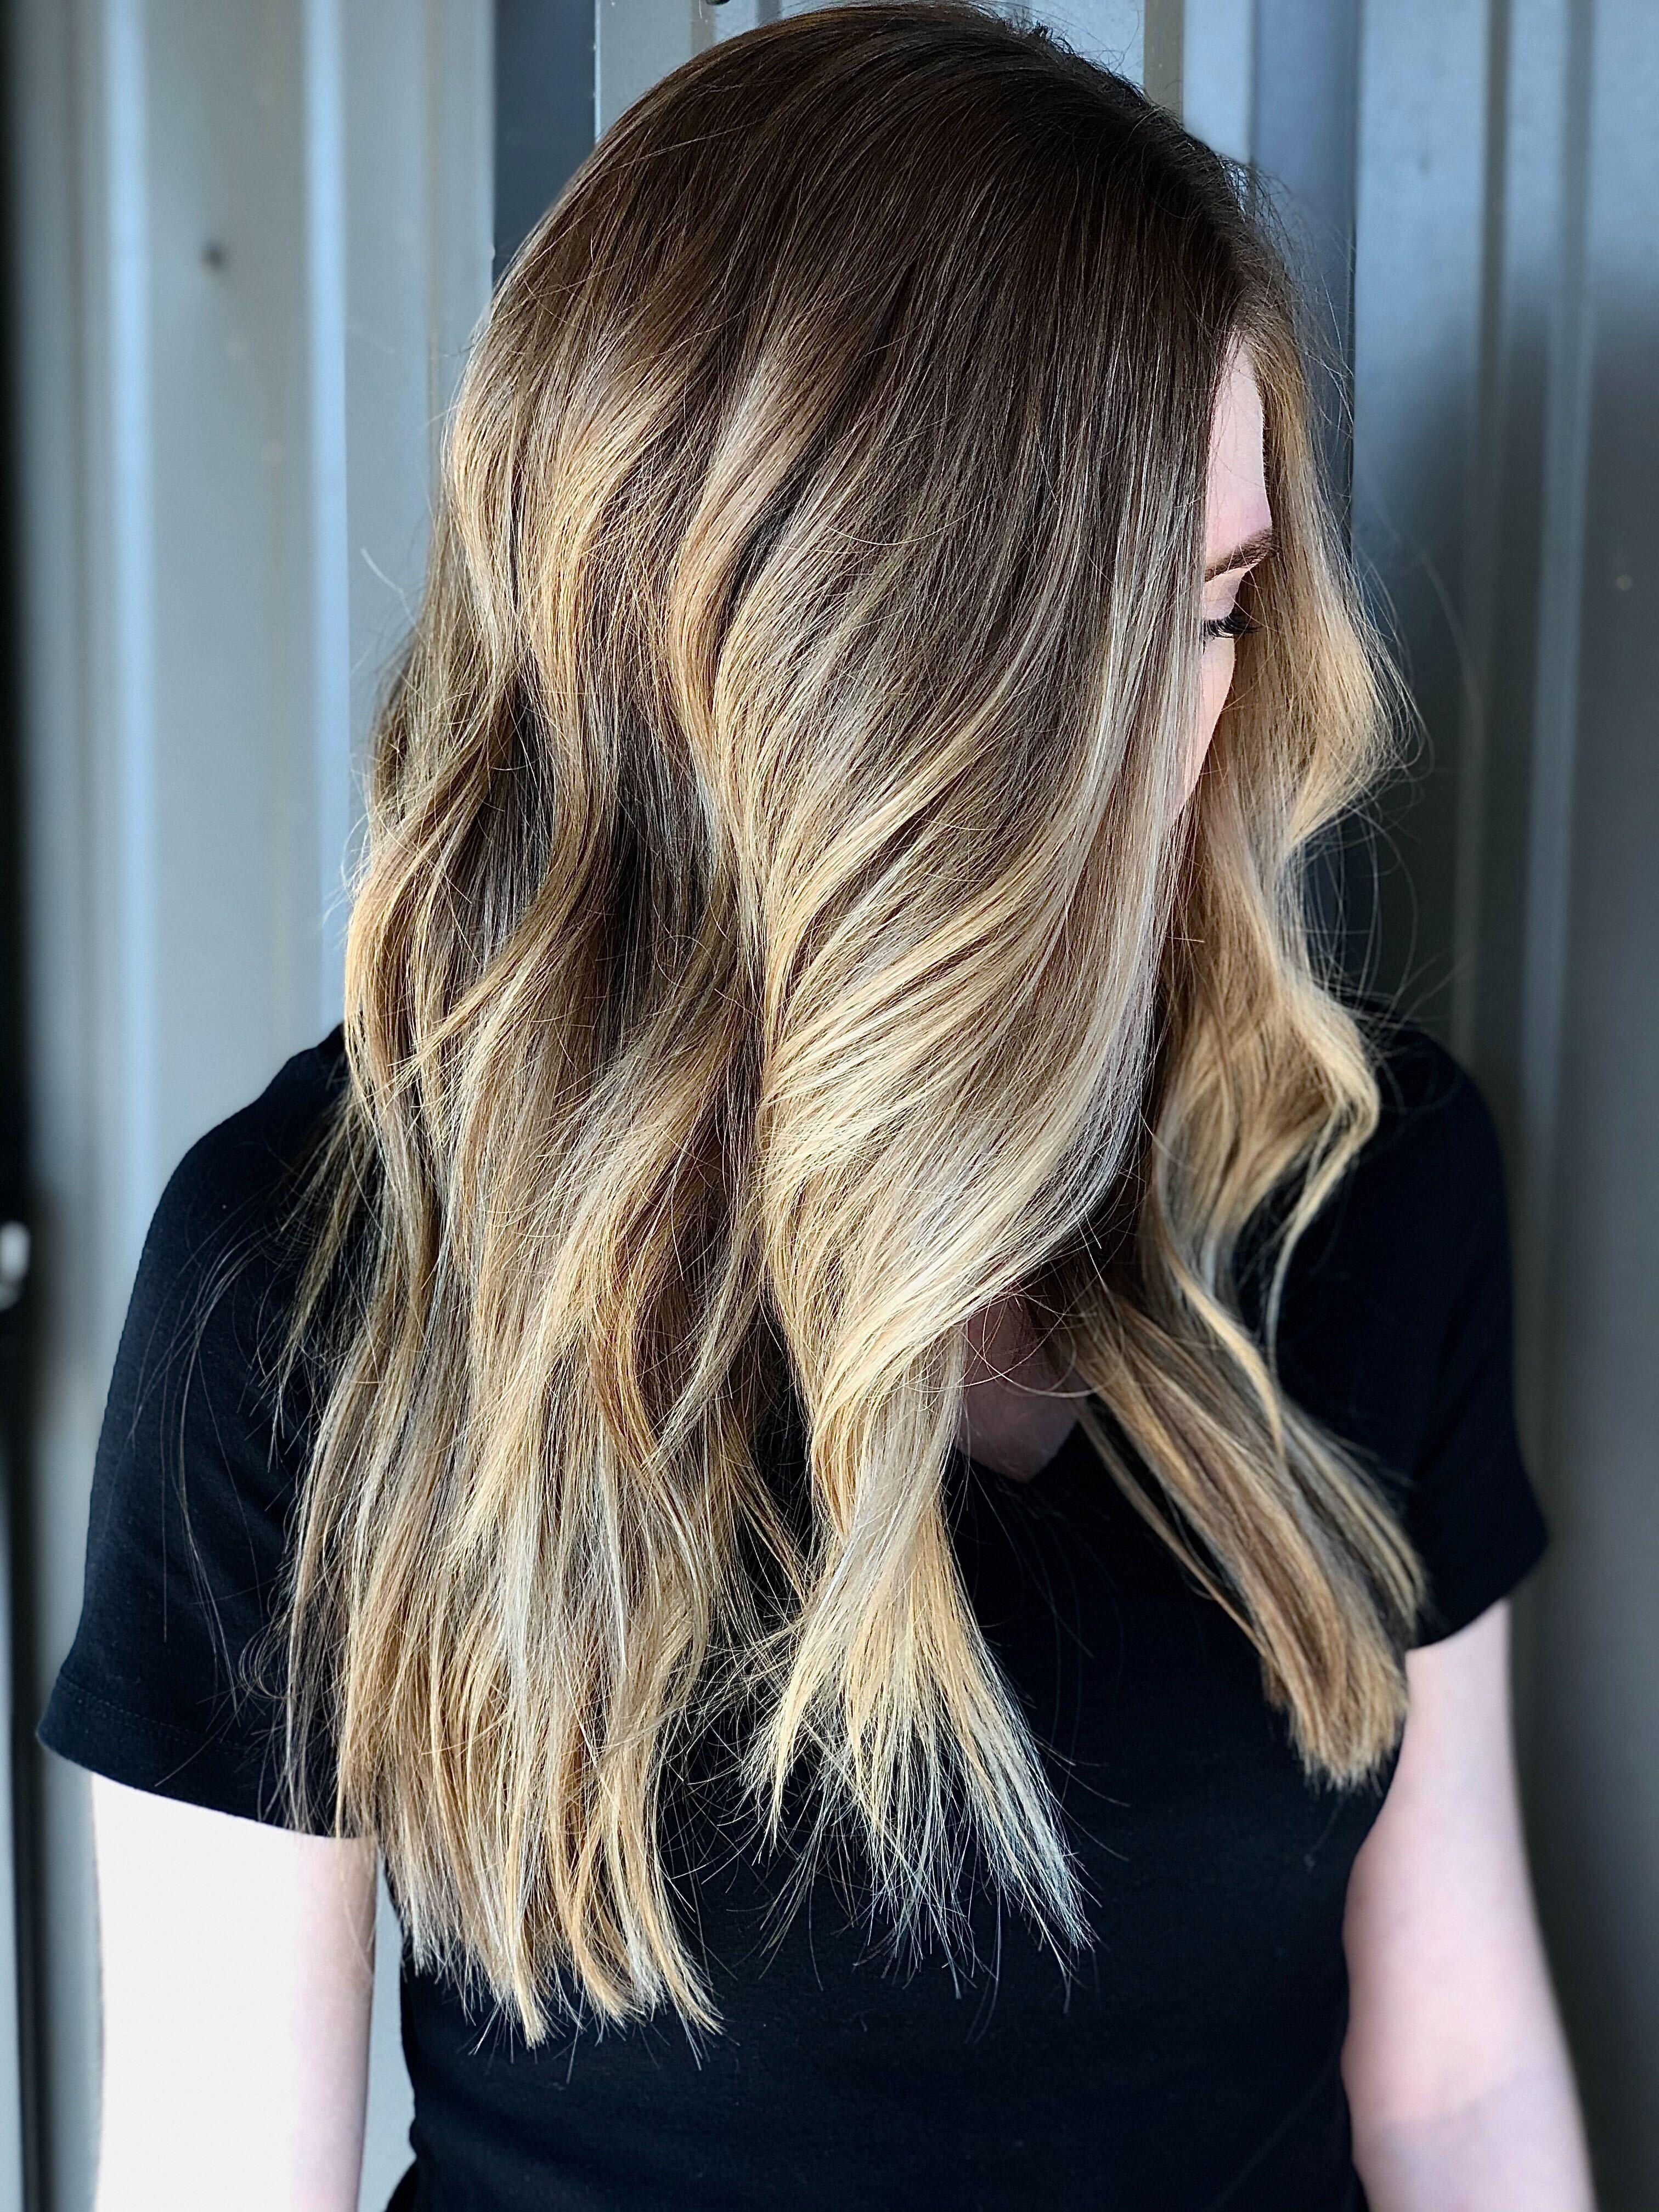 Hair Salon Easley Sc Haircuts Hair Color Balayage Bridal Hair Men S Hair Hair Salons Near Me Easley Sc Greenville Sc Anderson Sc In 2020 Balayage Blonde Hair Color Hair Color